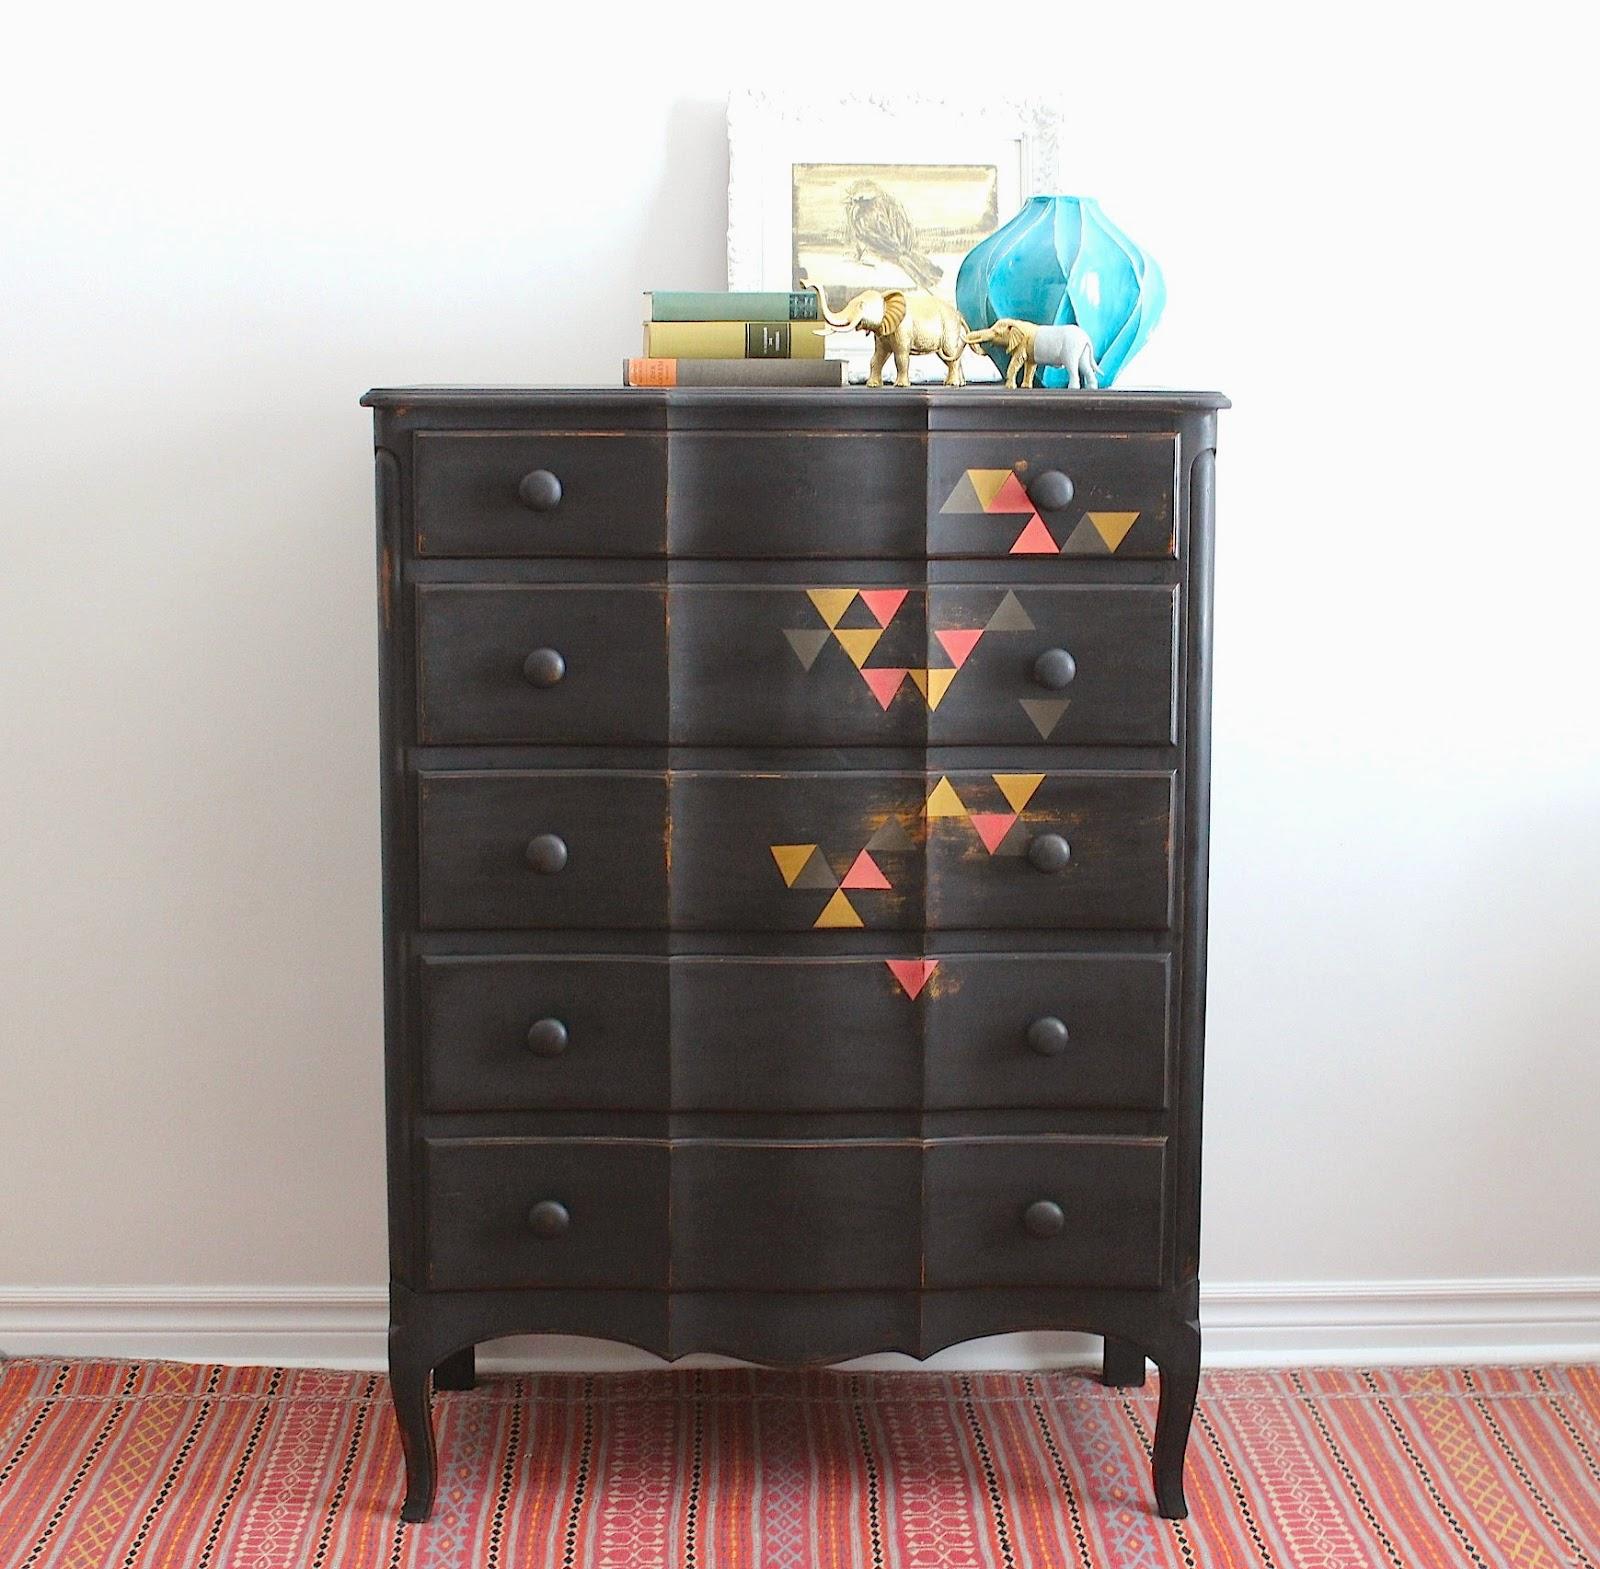 Black Tallboy Dresser With Triangles